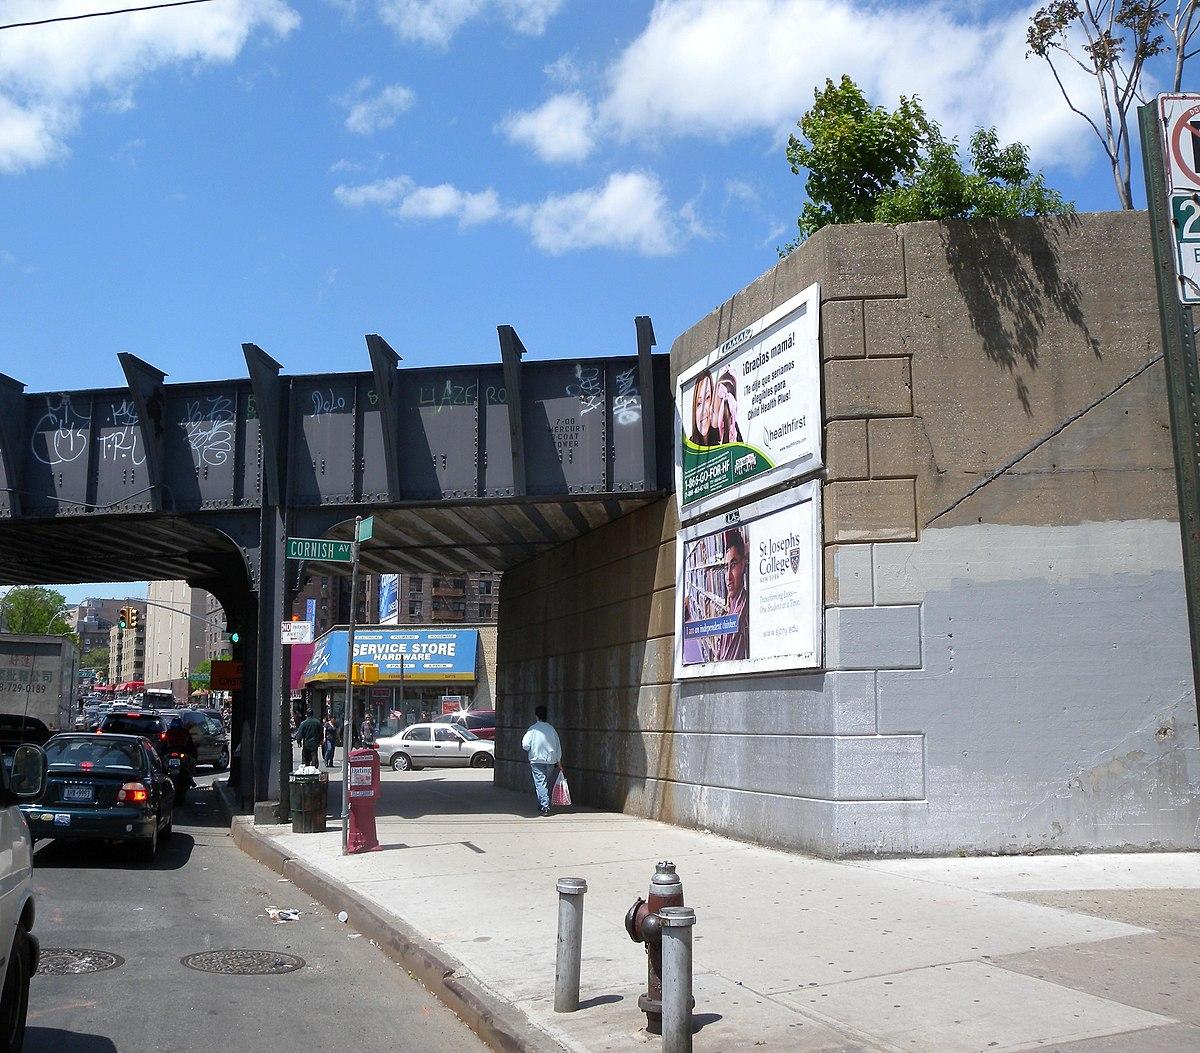 elmhurst station lirr wikipedia